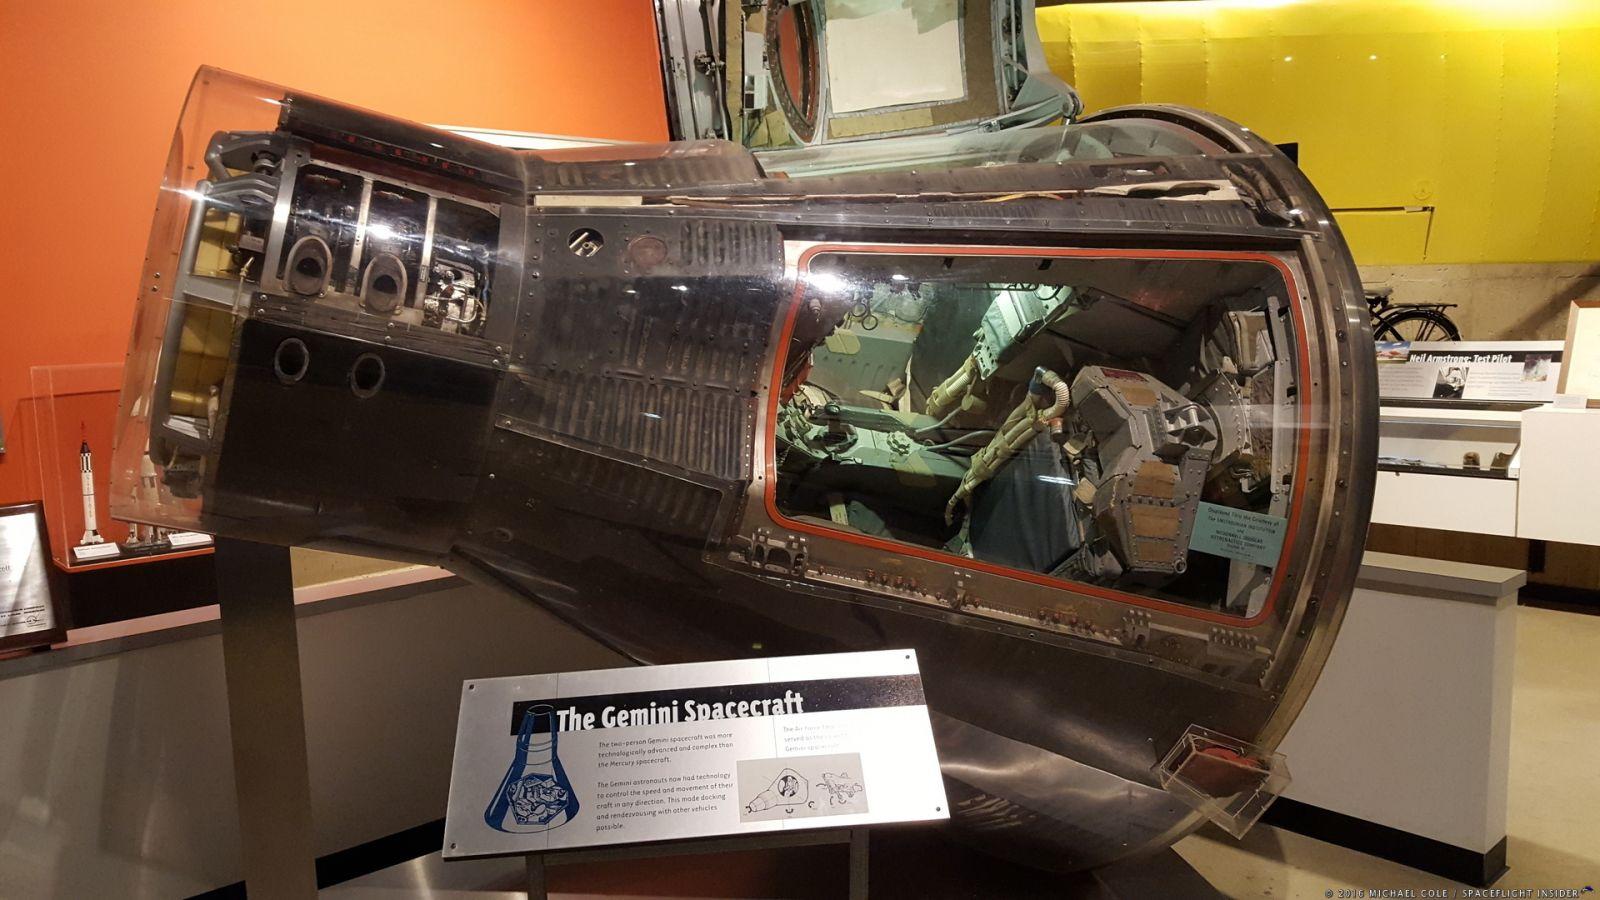 31c356dbcb Gemini 8 Homework Sample - May 2019